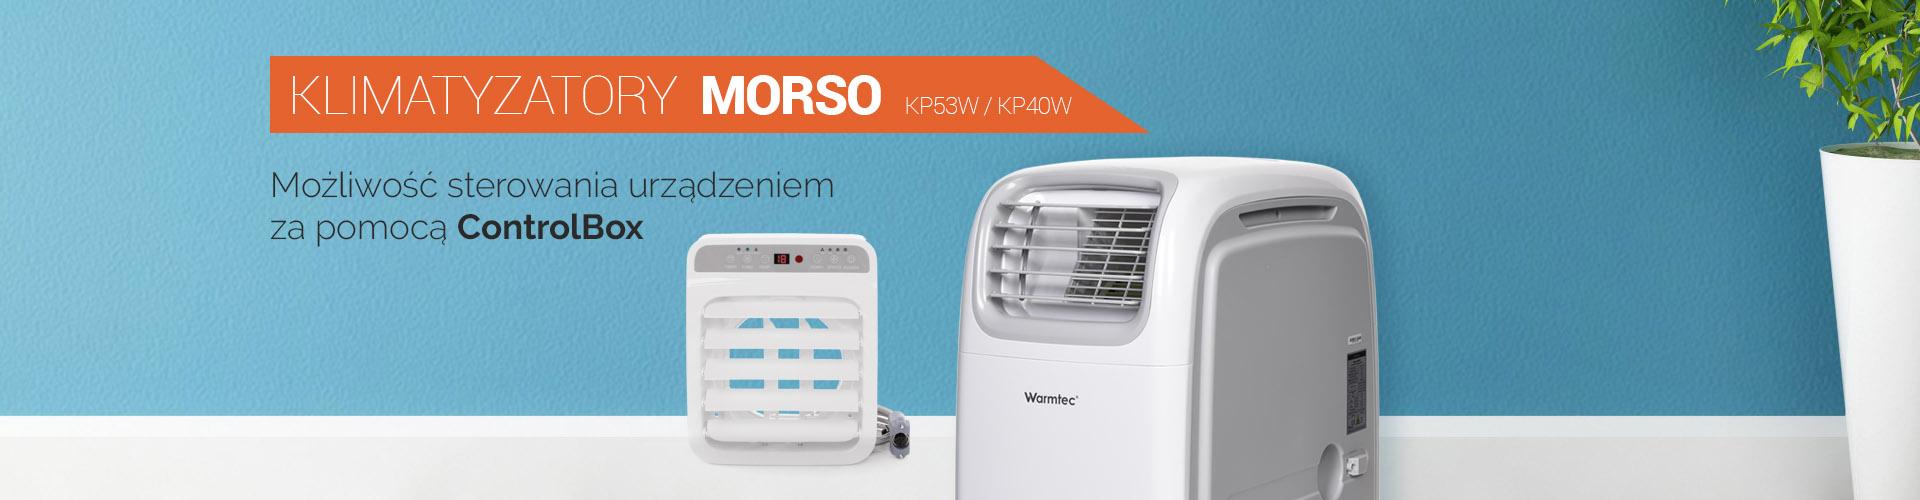 Klimatyzator Morso Kp53W